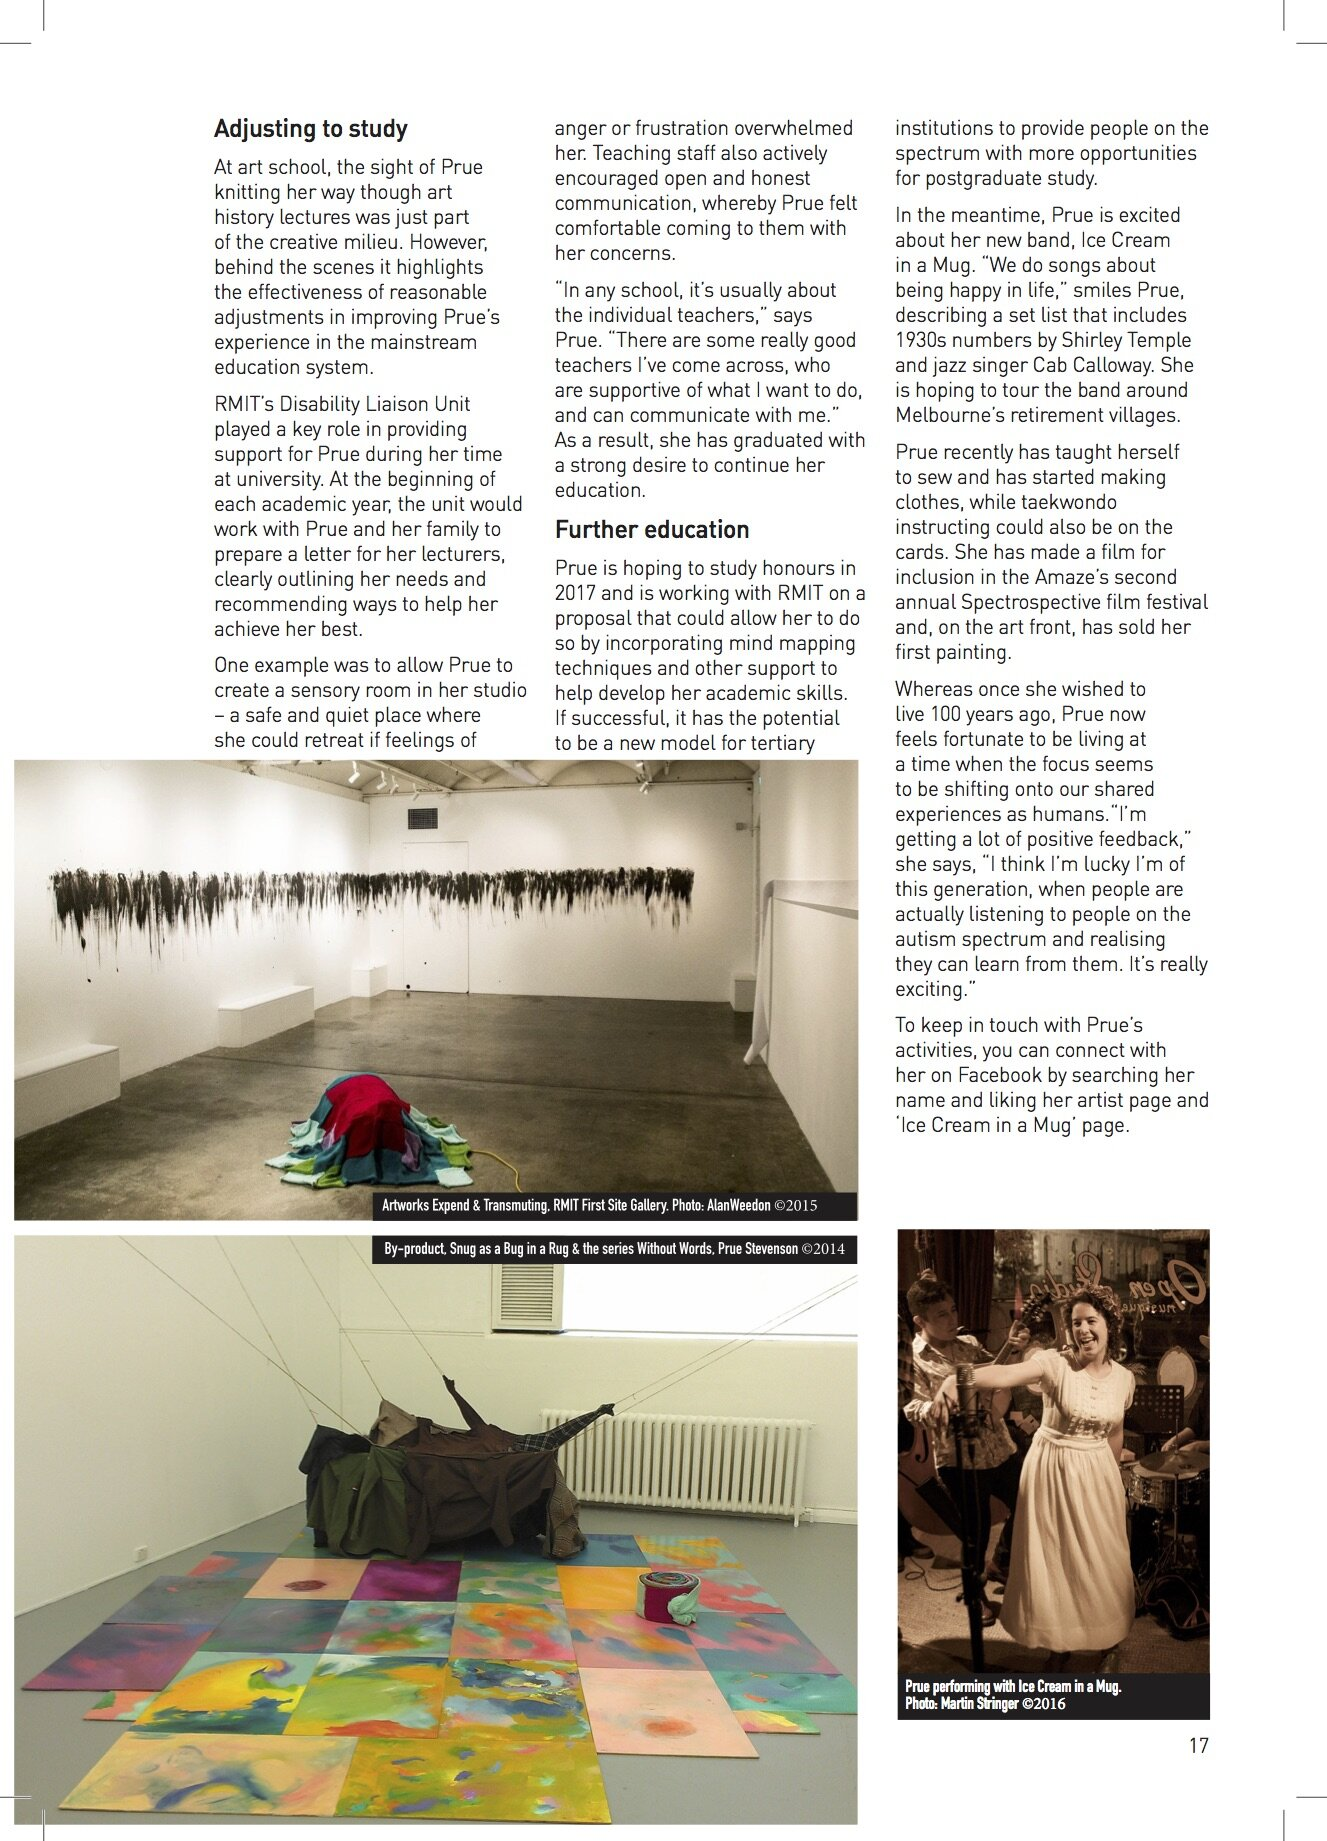 The Spectrum Magazine Page 2